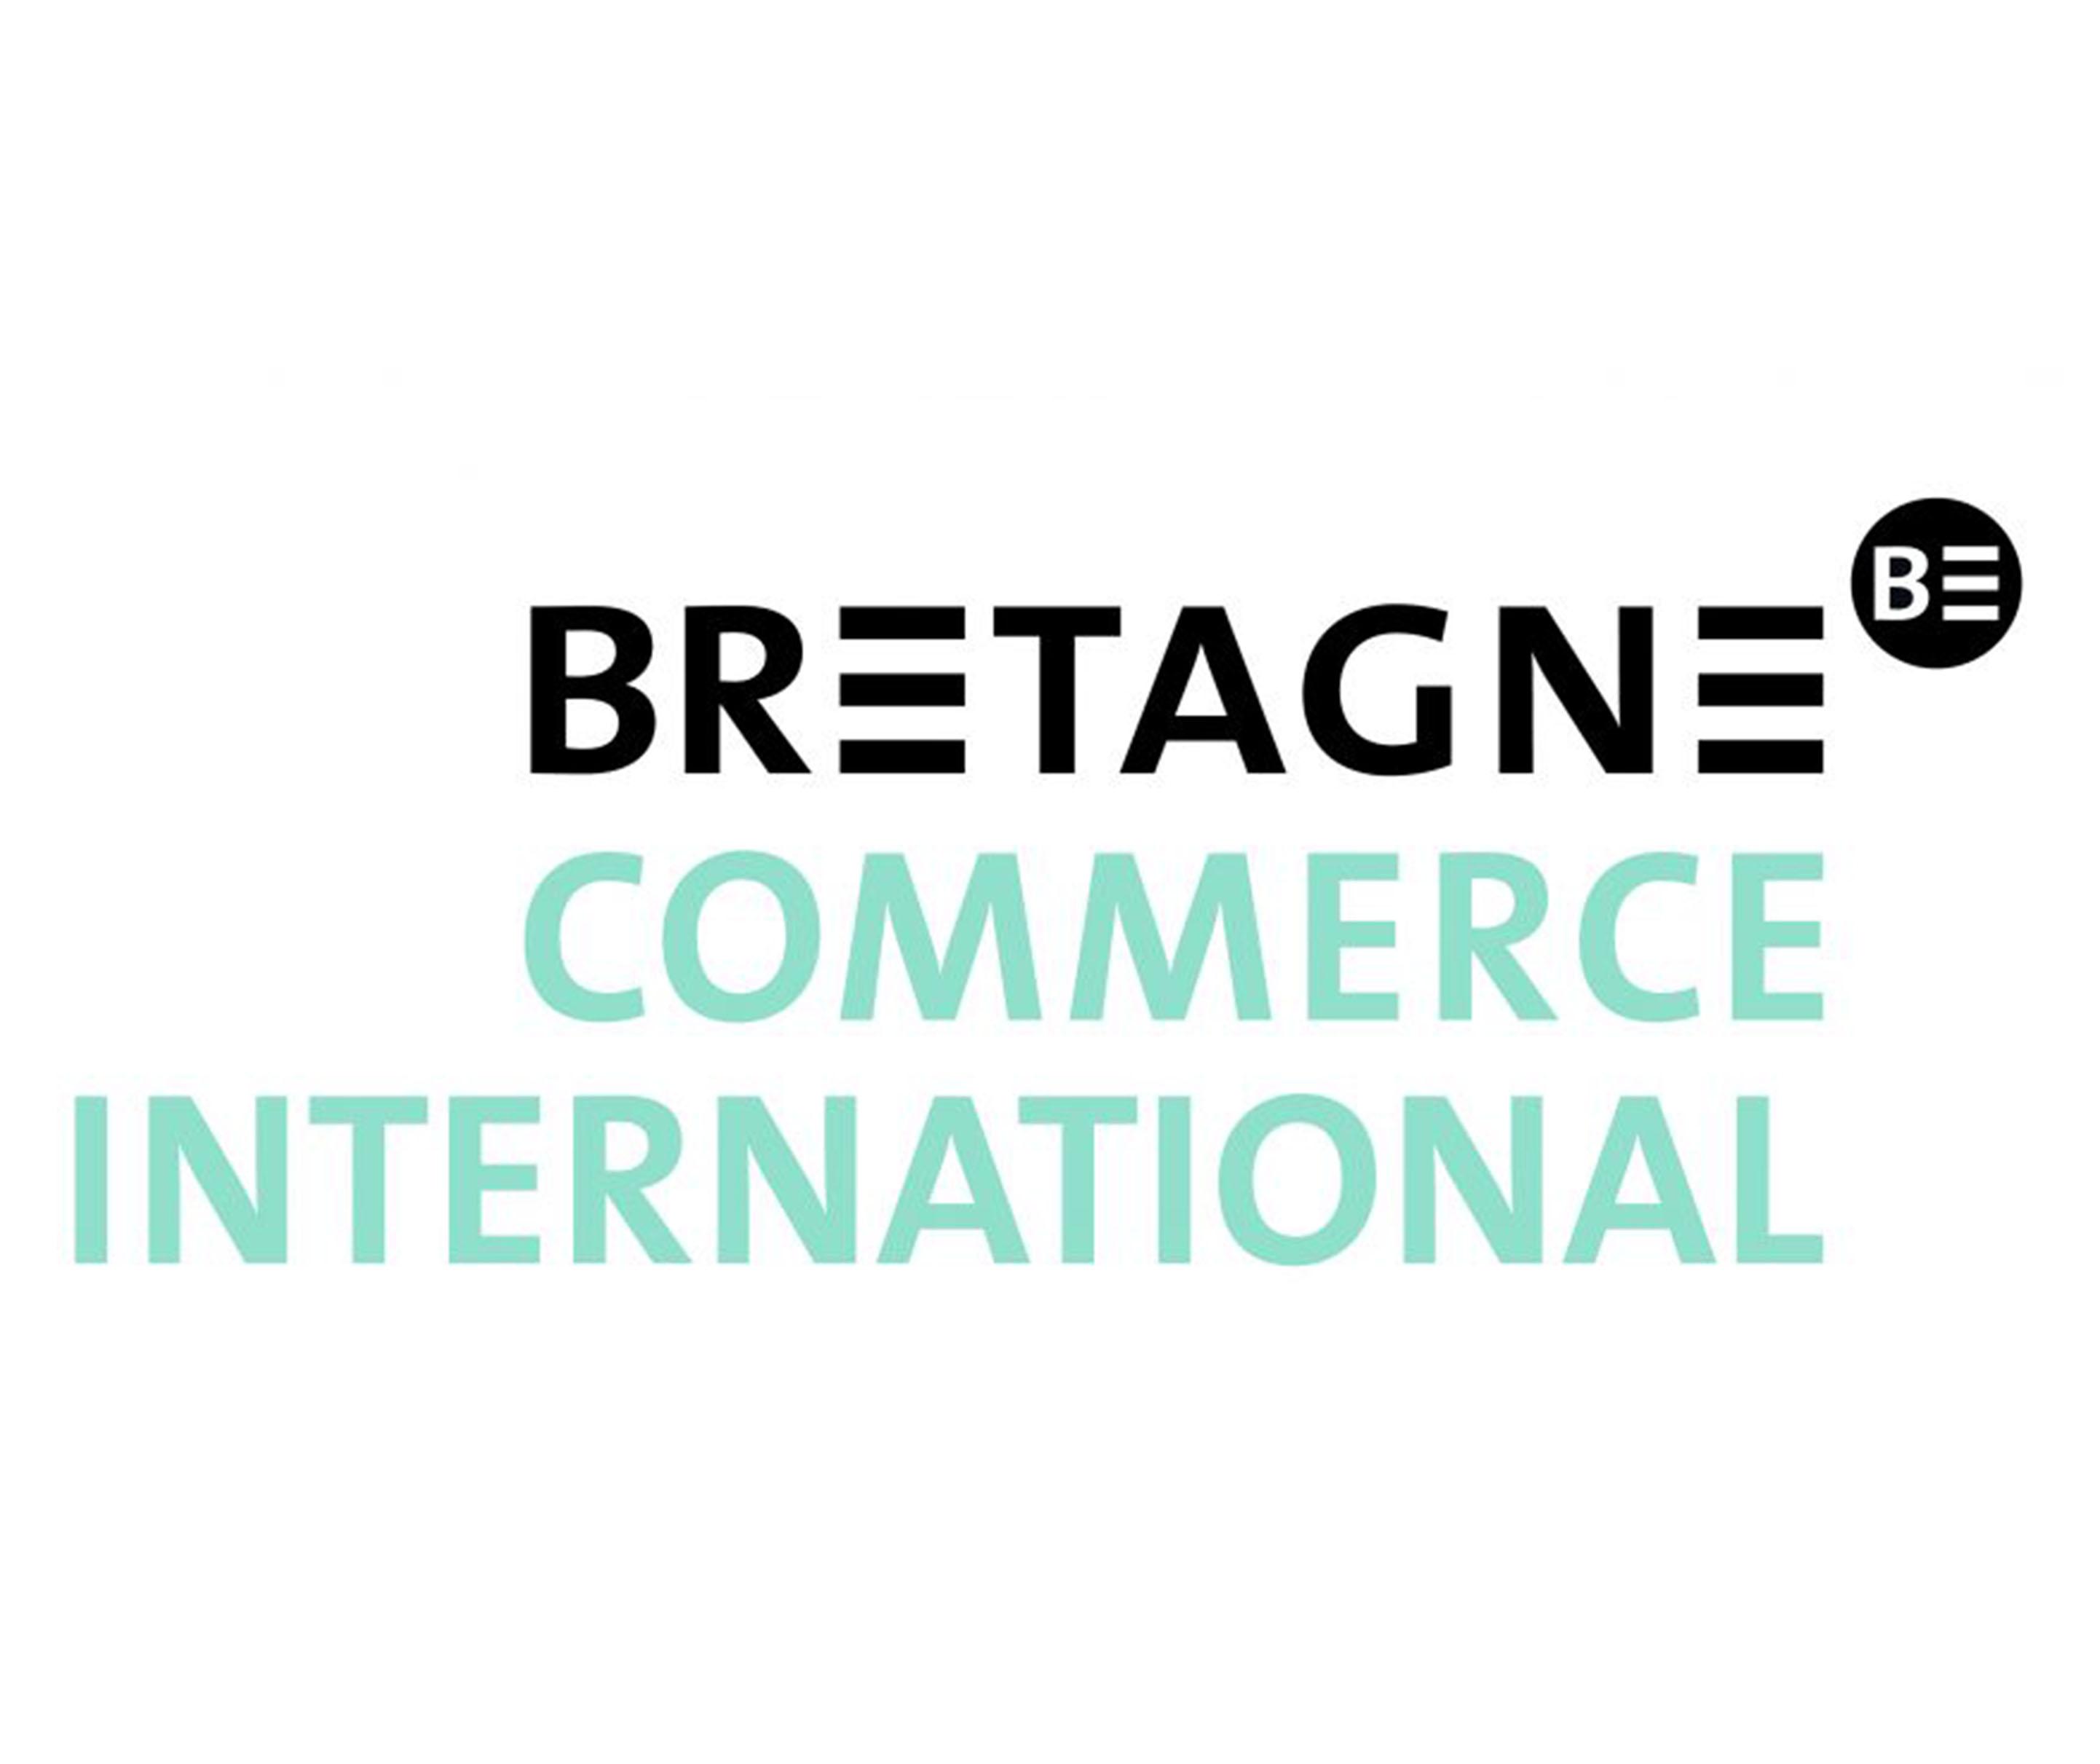 Bretagne Commerce International Logo